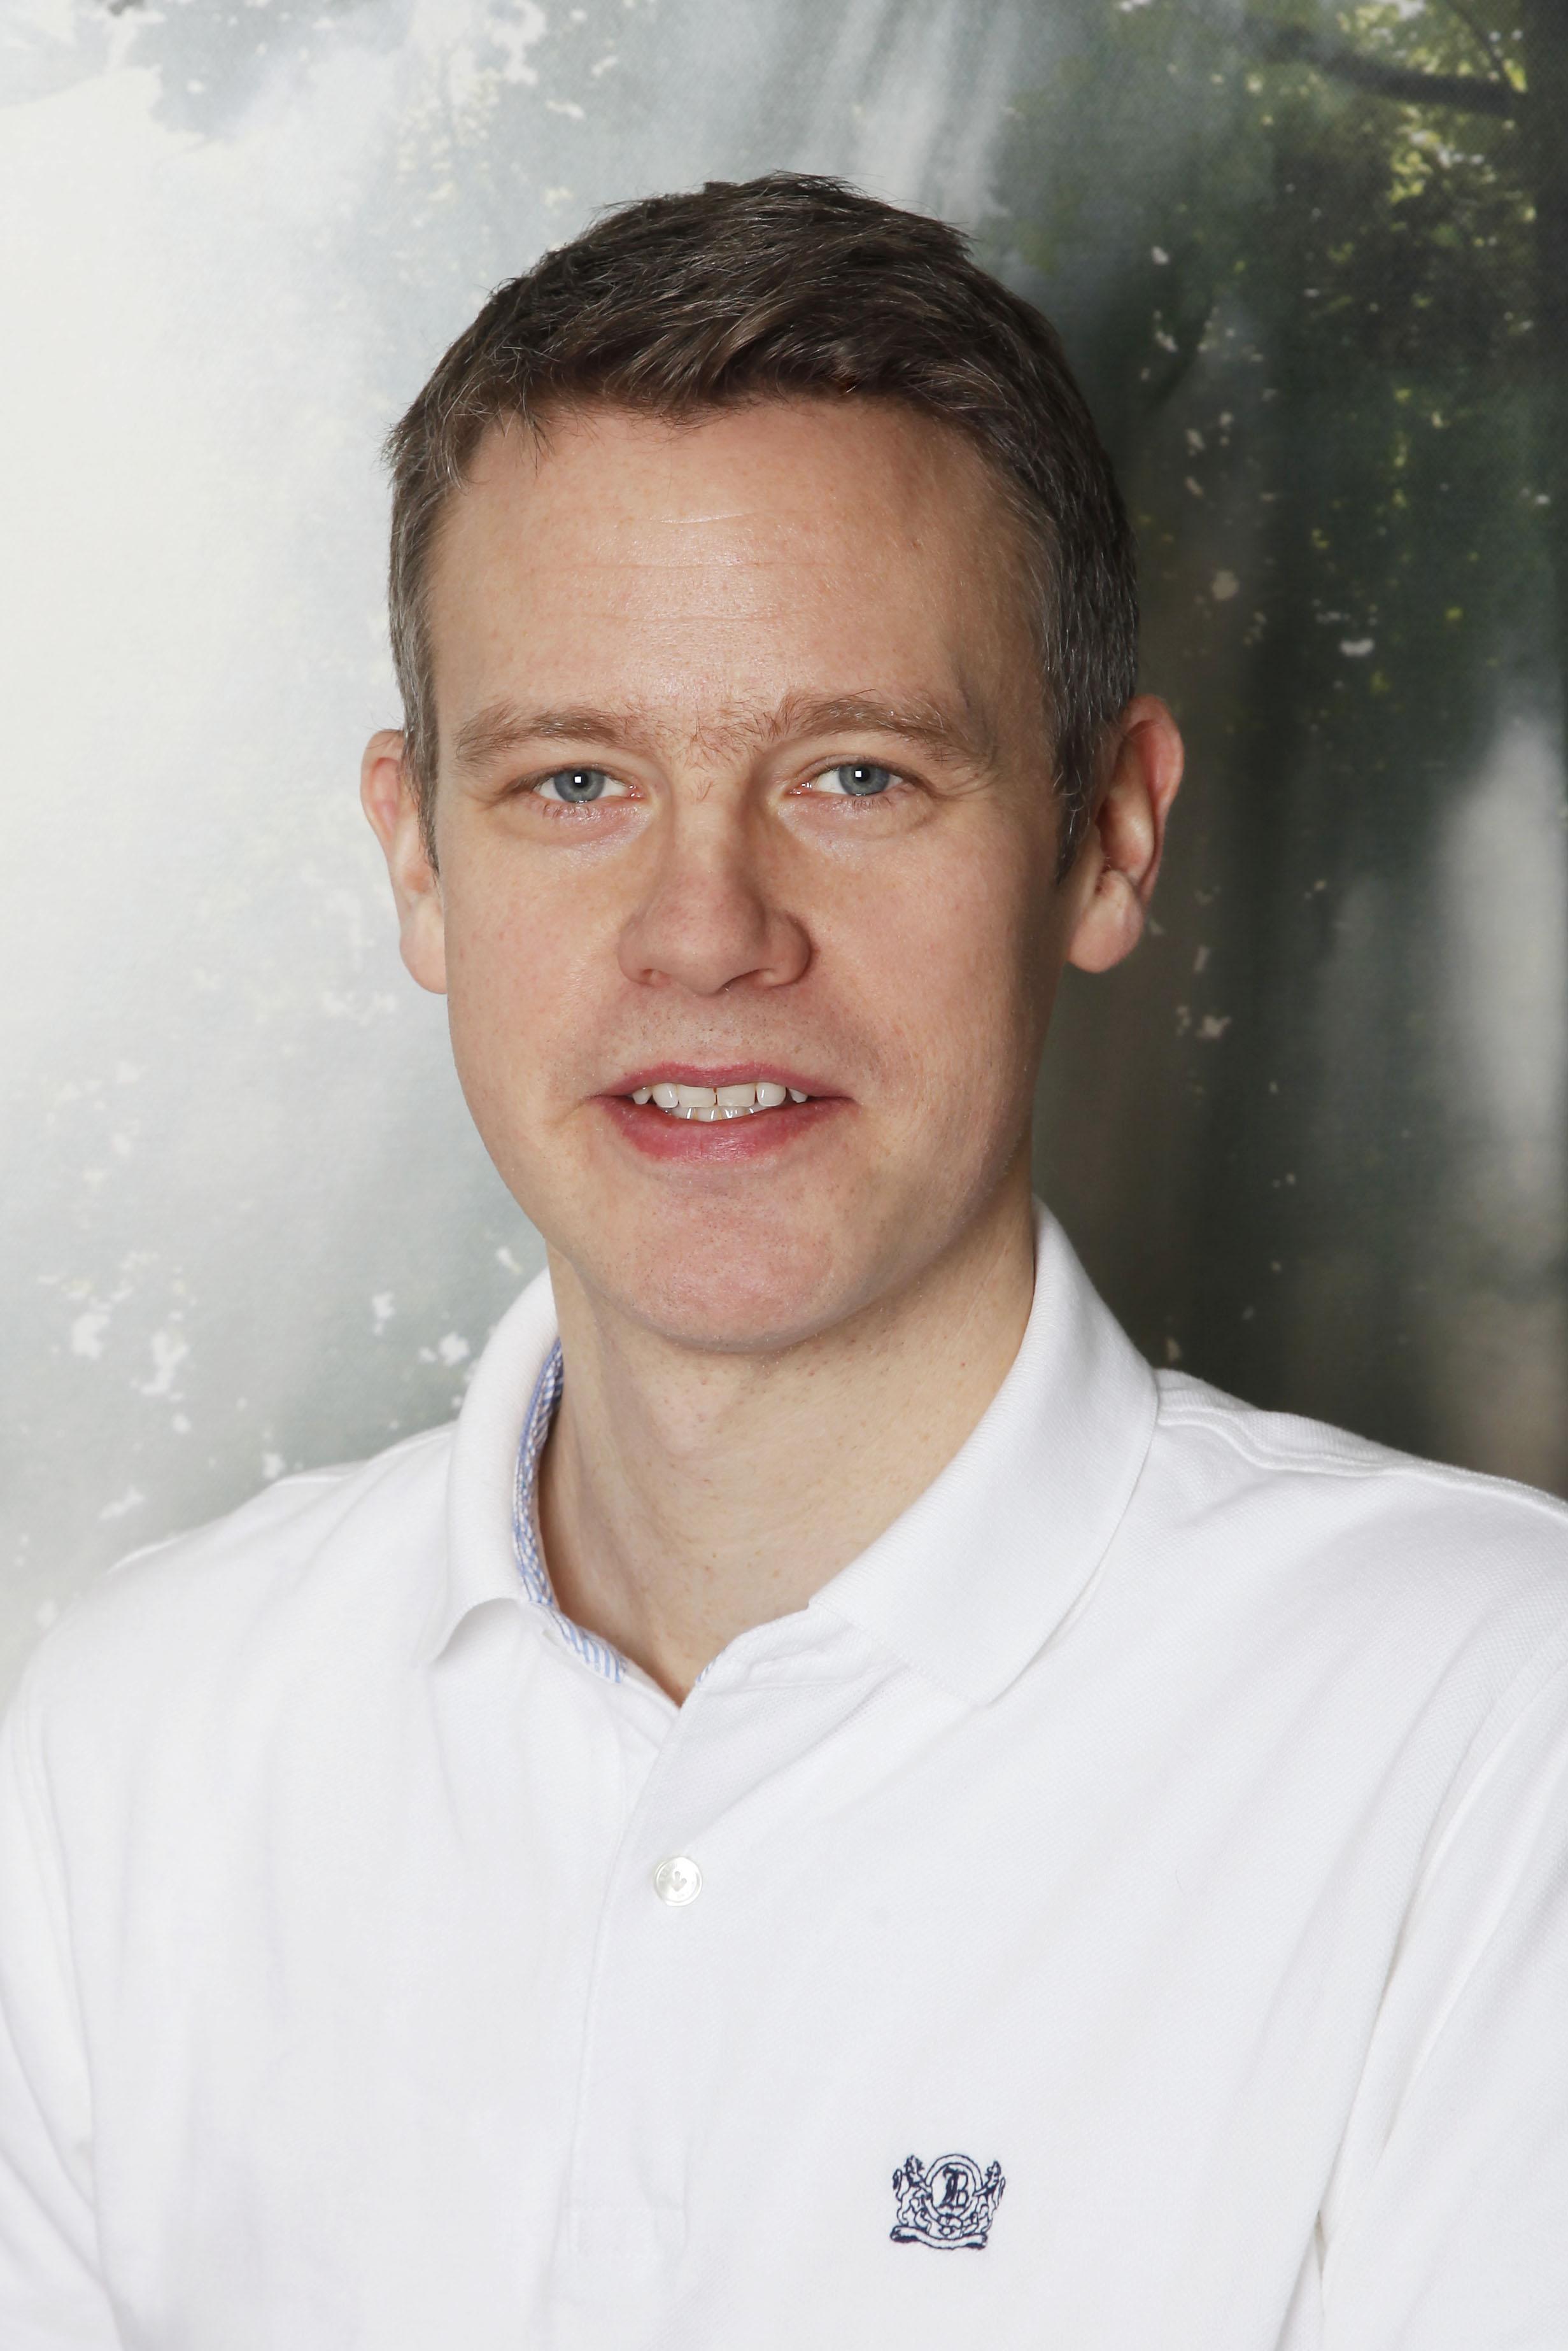 Robert Olander